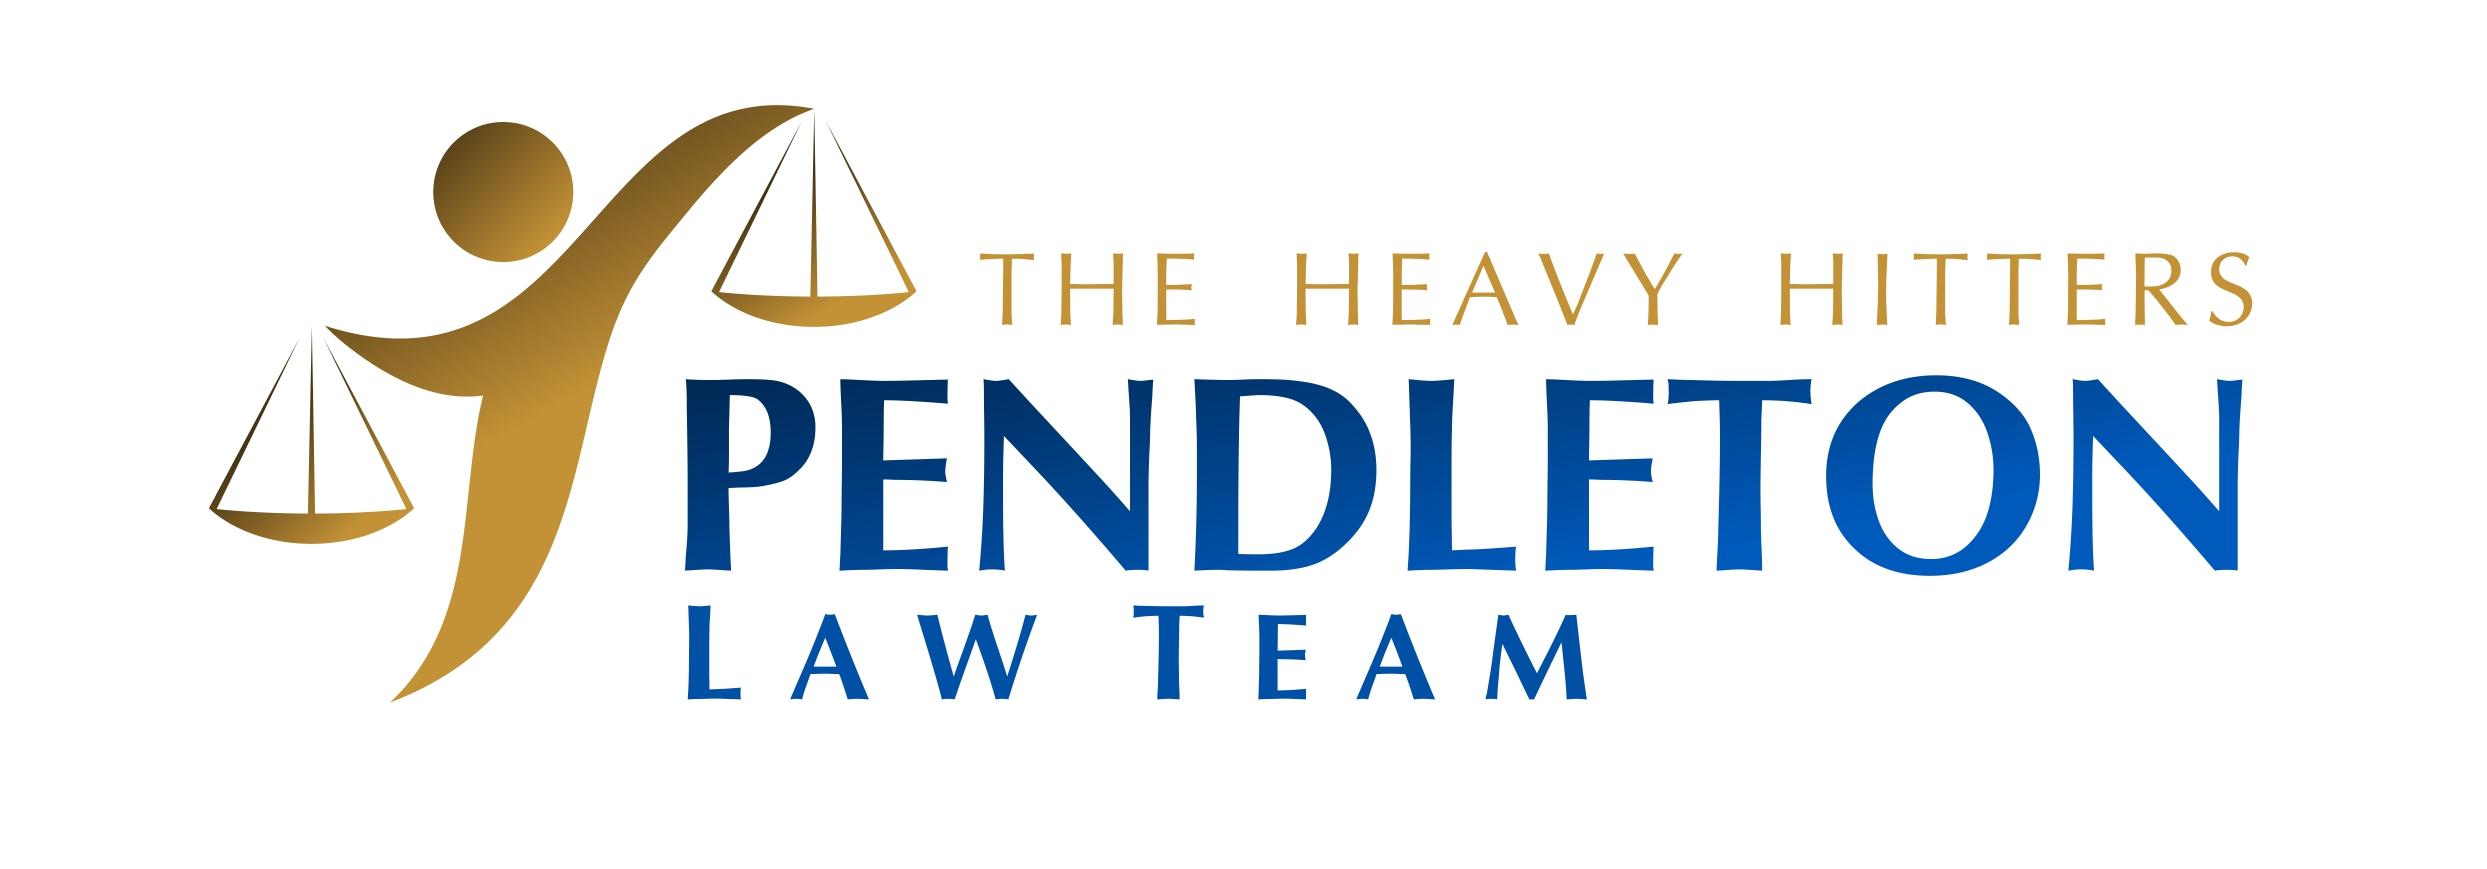 Pendleton Law Team